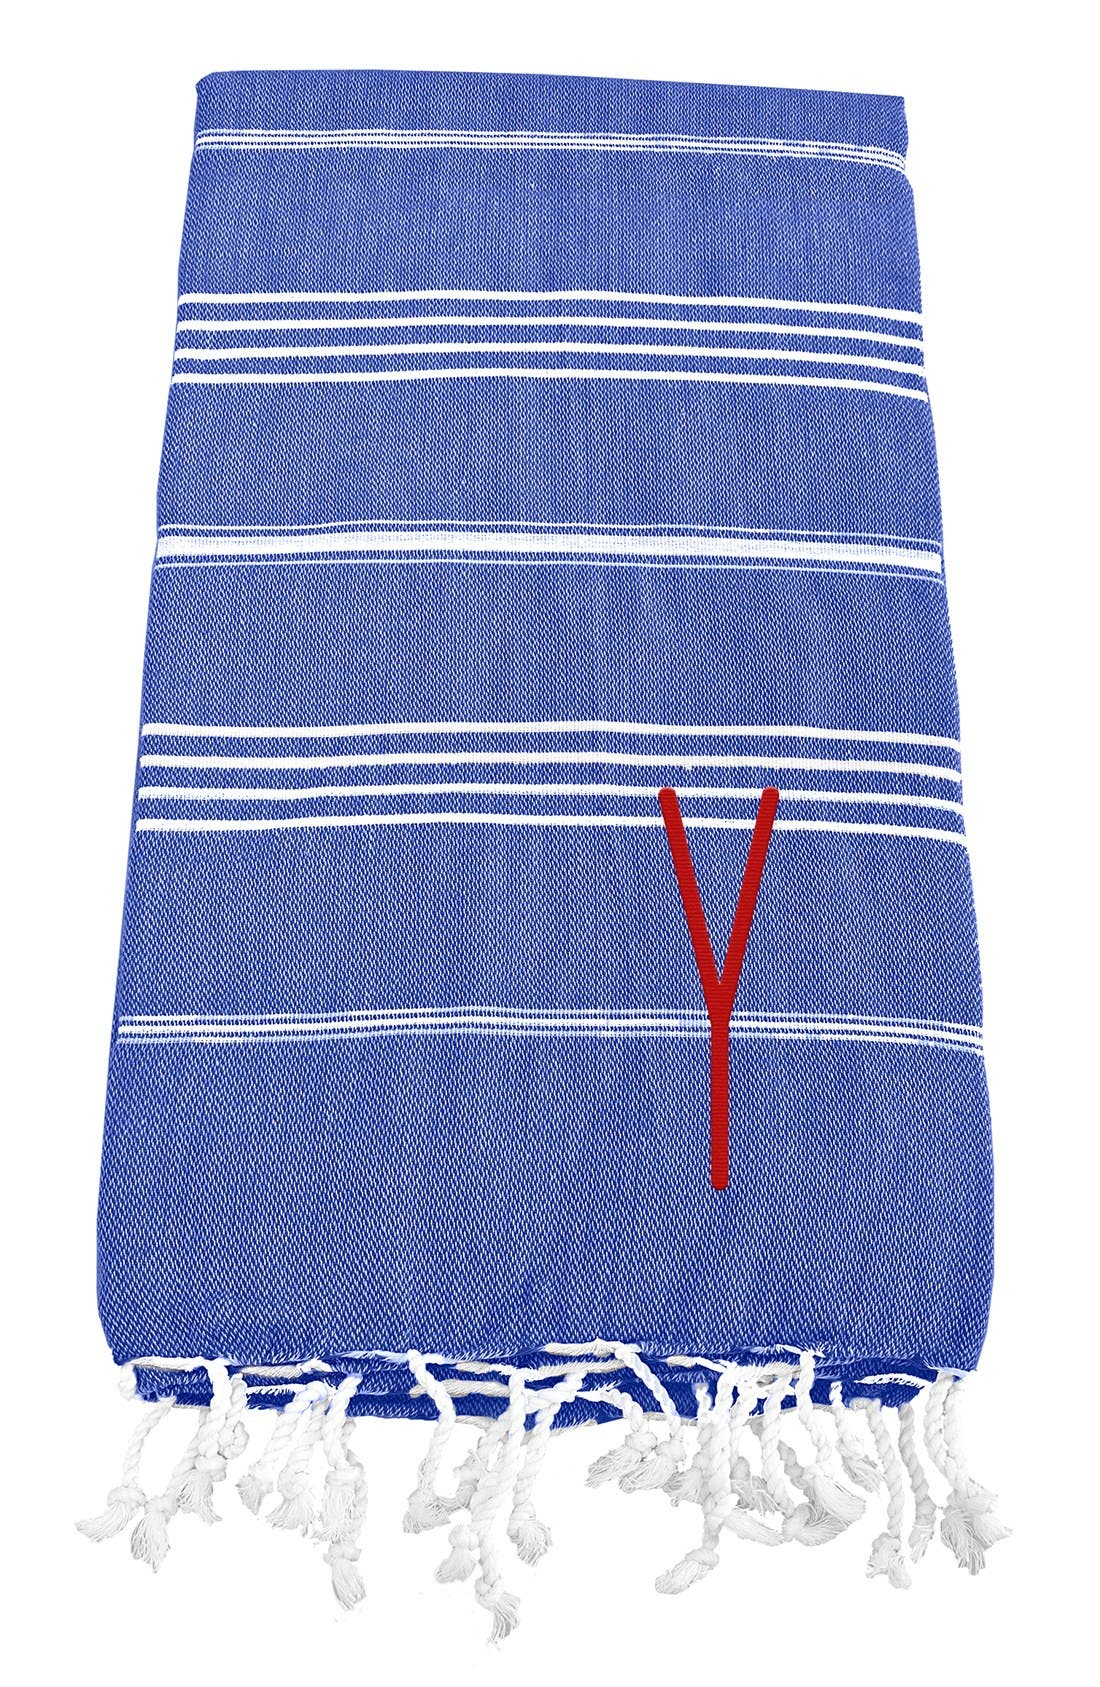 Monogram Turkish Cotton Towel,                             Main thumbnail 81, color,